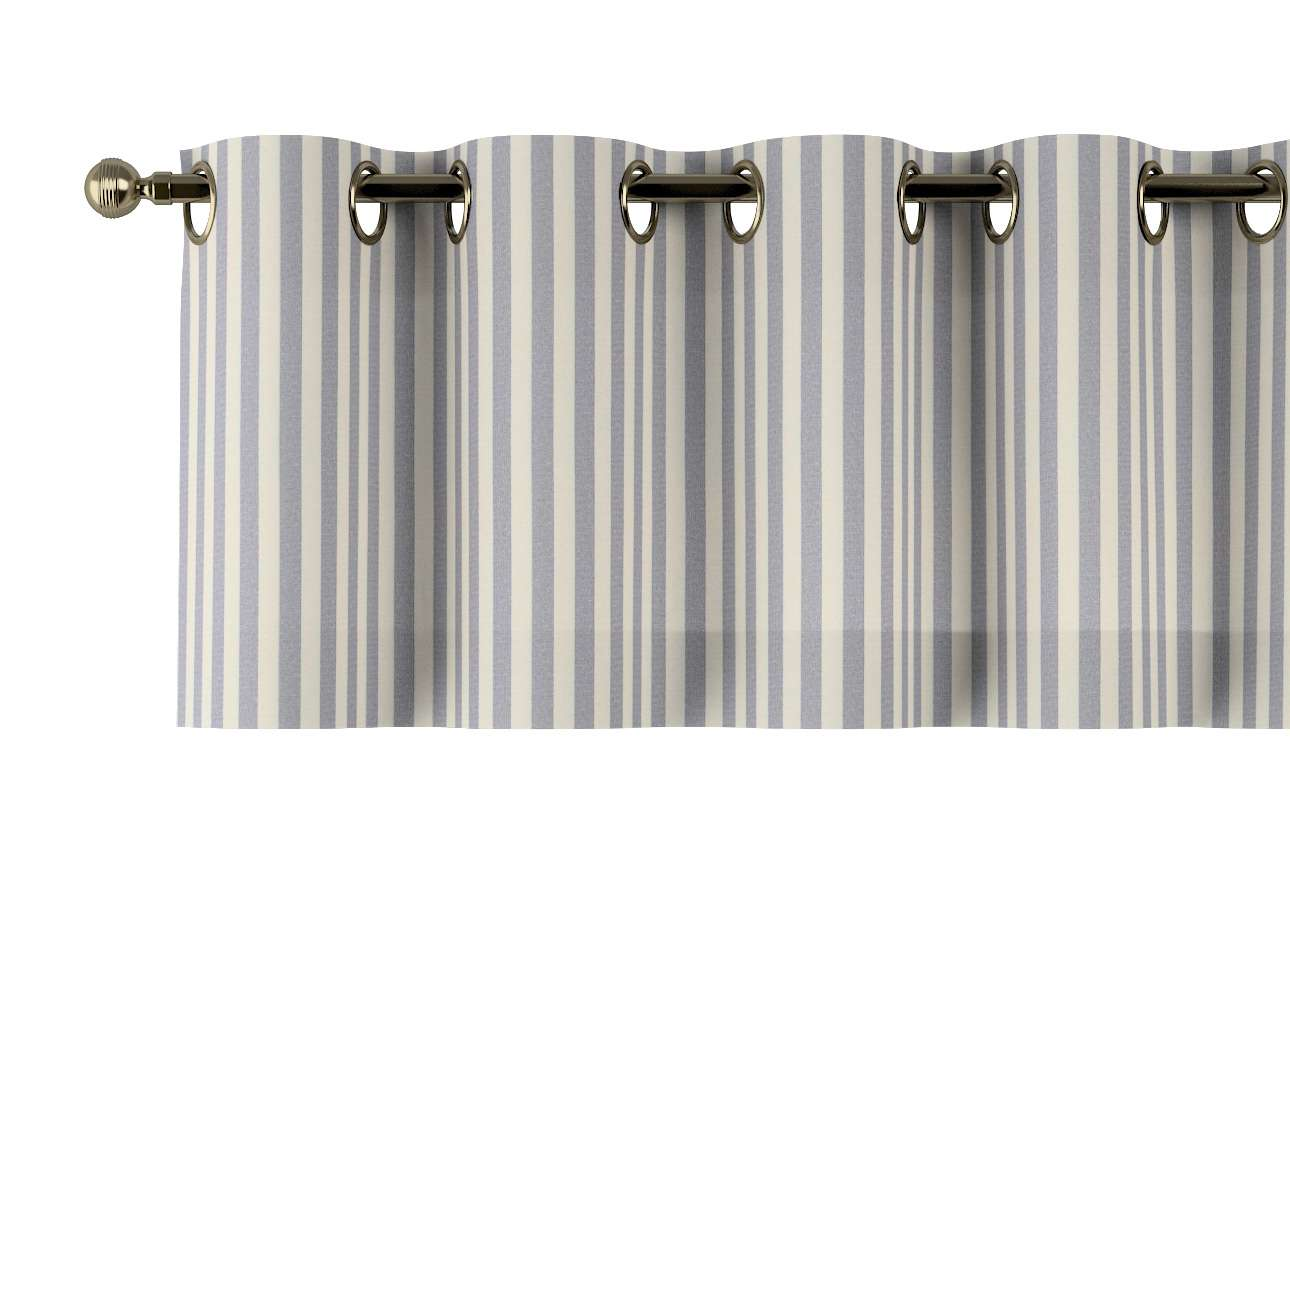 Lambrekin na kroužcích  130x40cm v kolekci Quadro, látka: 136-02